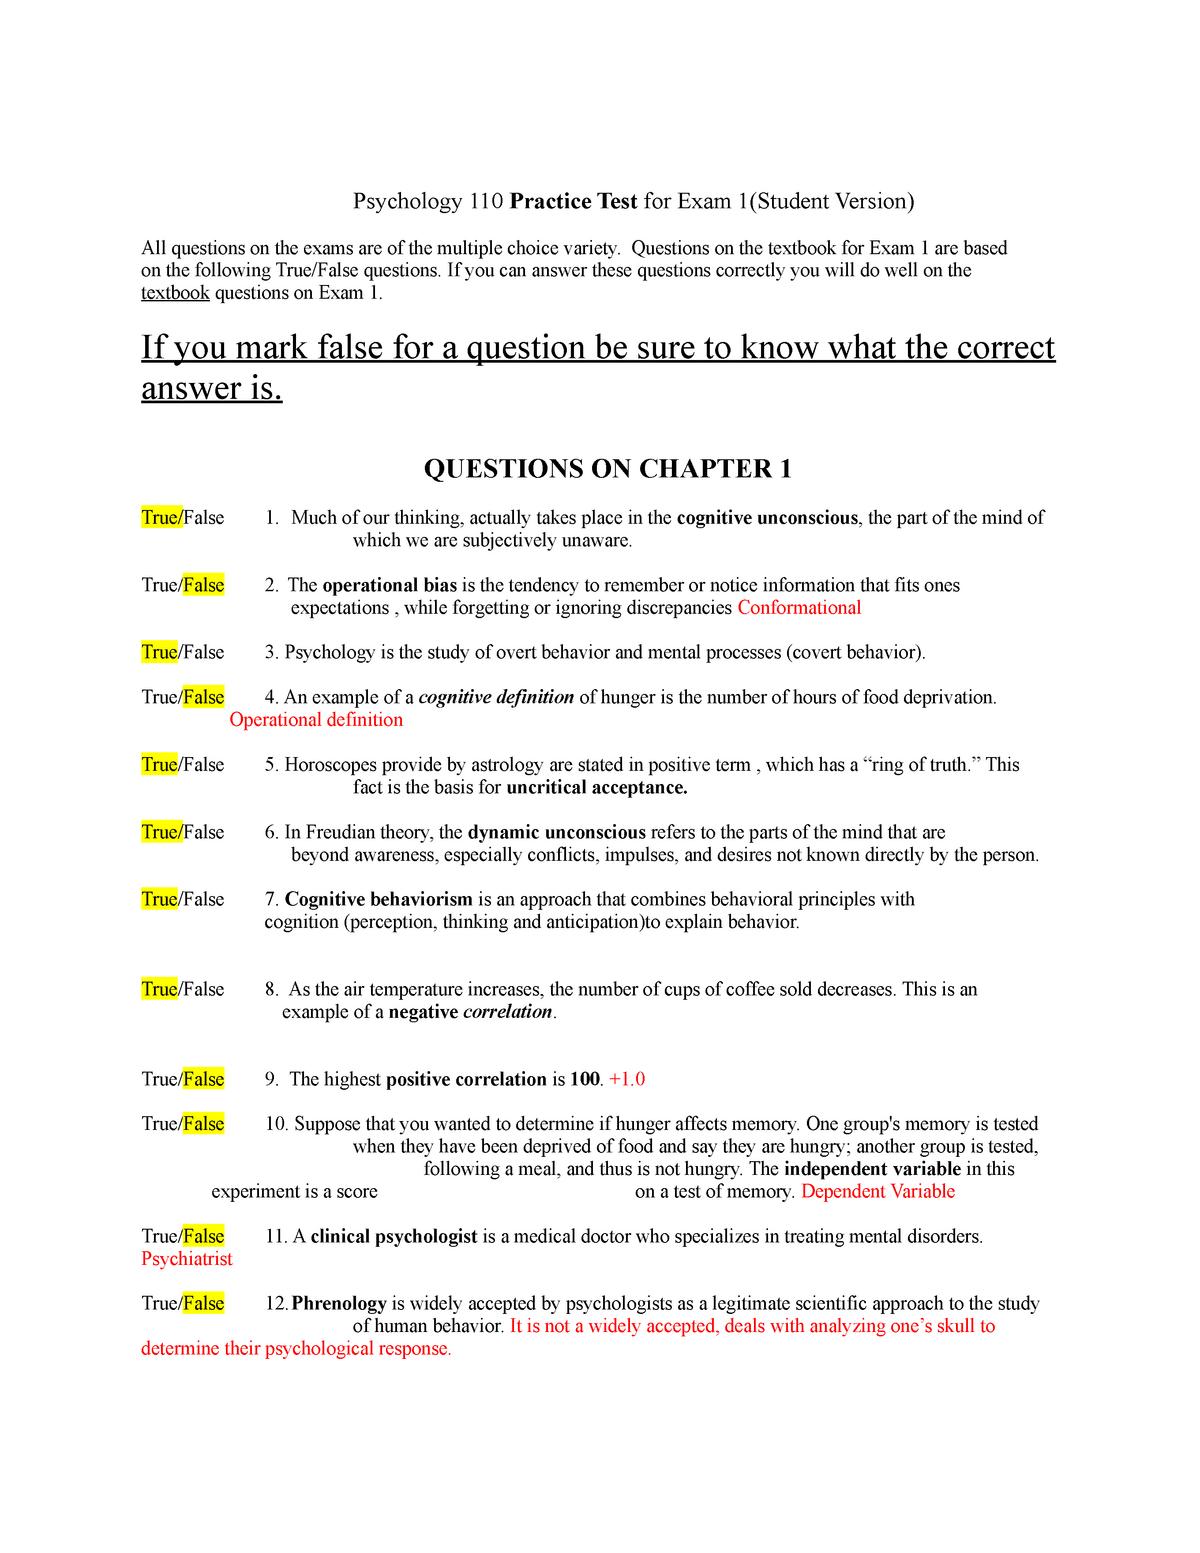 PSY 110 student practice exam 1 - PSY 201 Soc Psy: Psy Persp